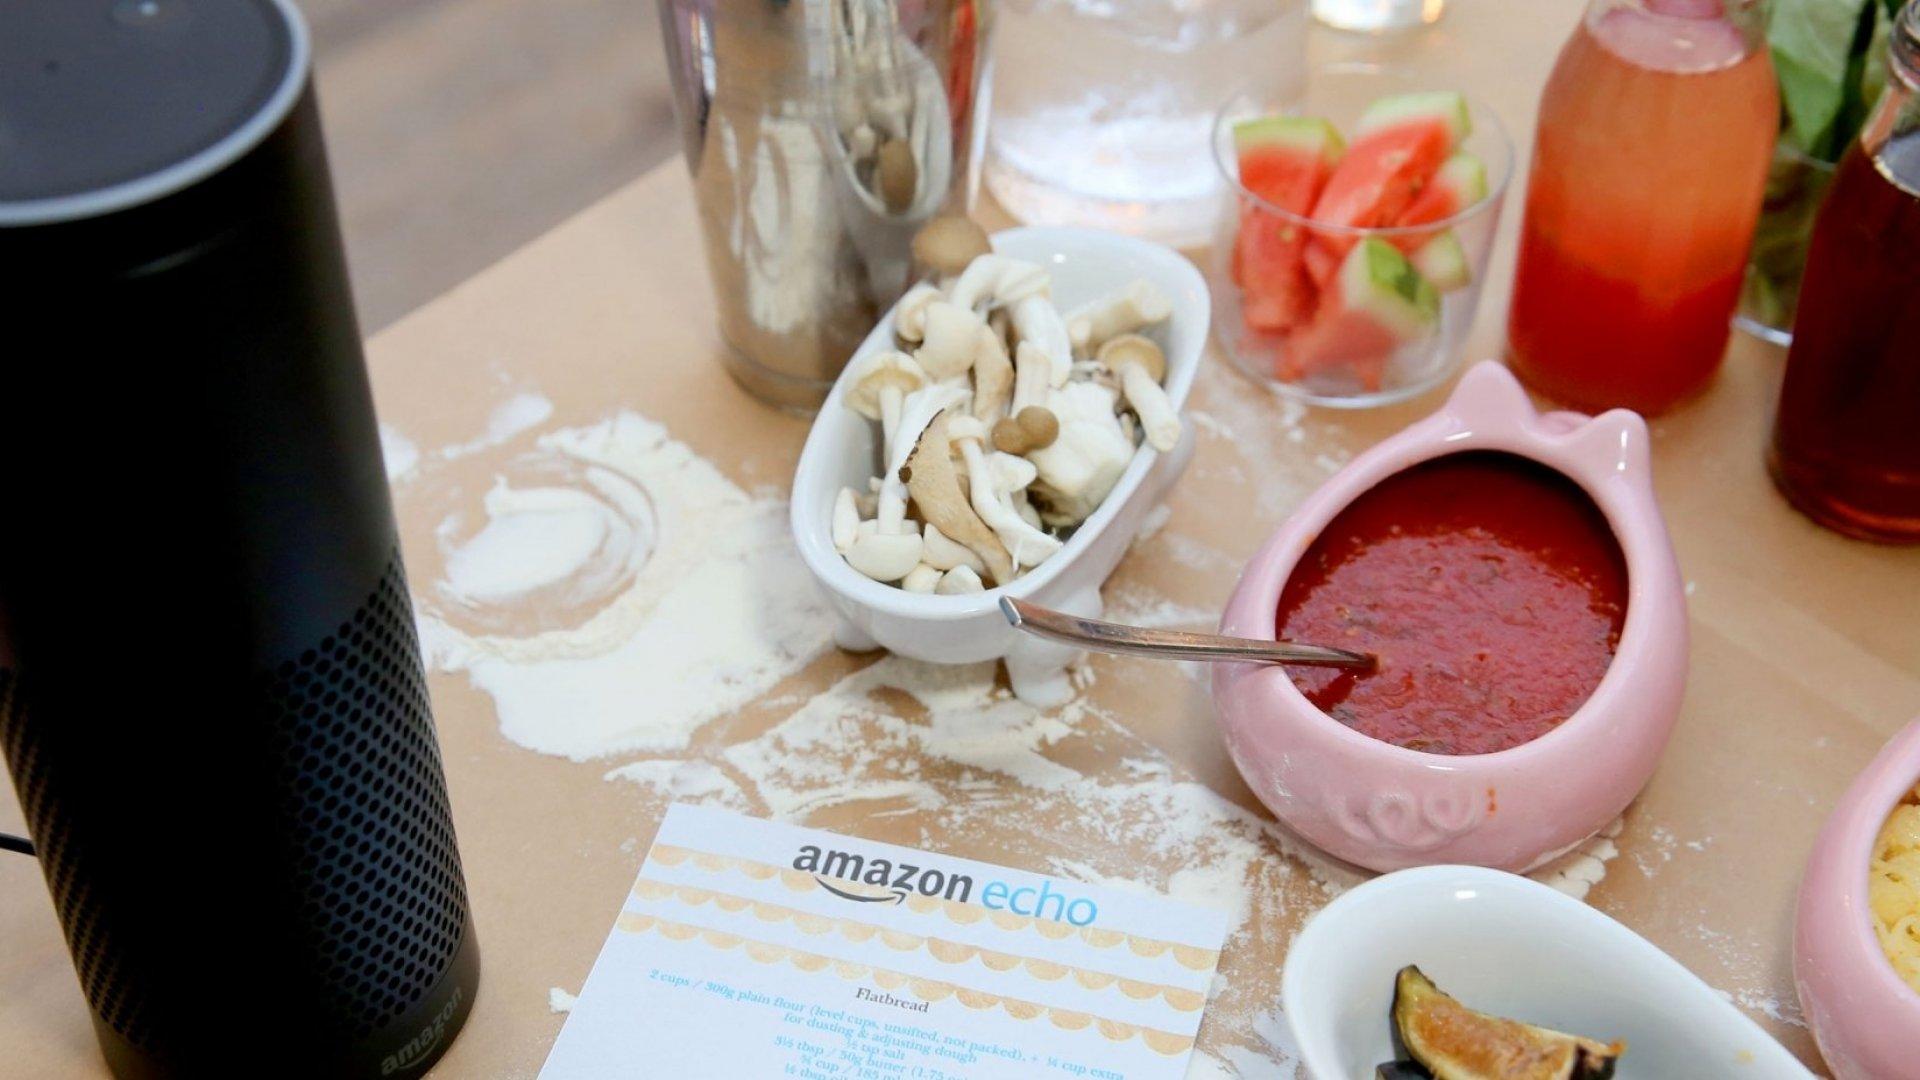 Amazon Alexa Recordings Demanded by Police in Murder Case